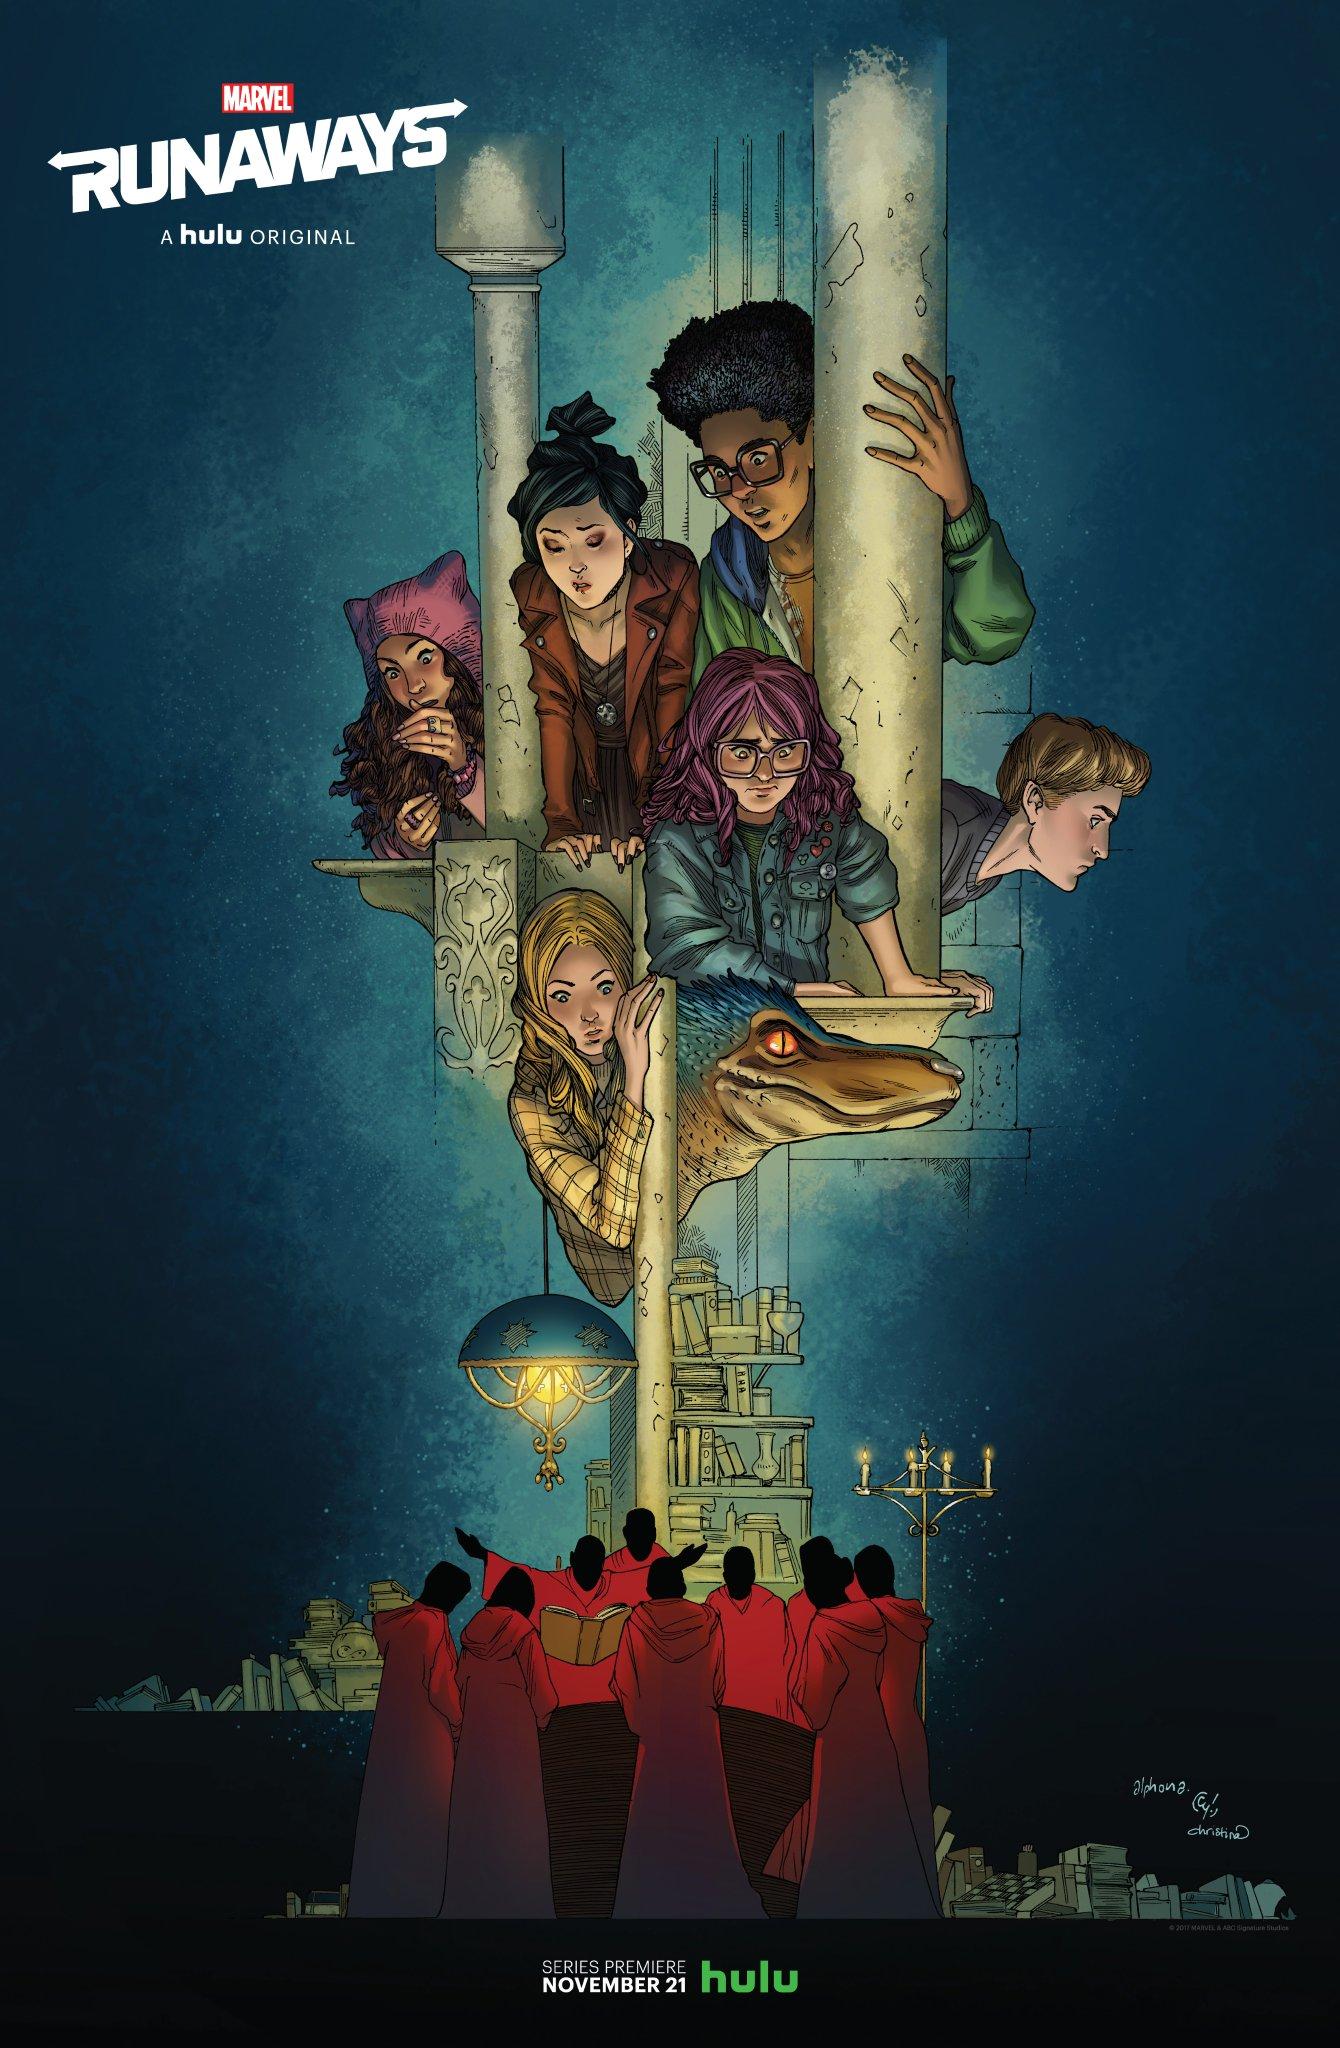 Marvel's Runaways poster 002.jpg